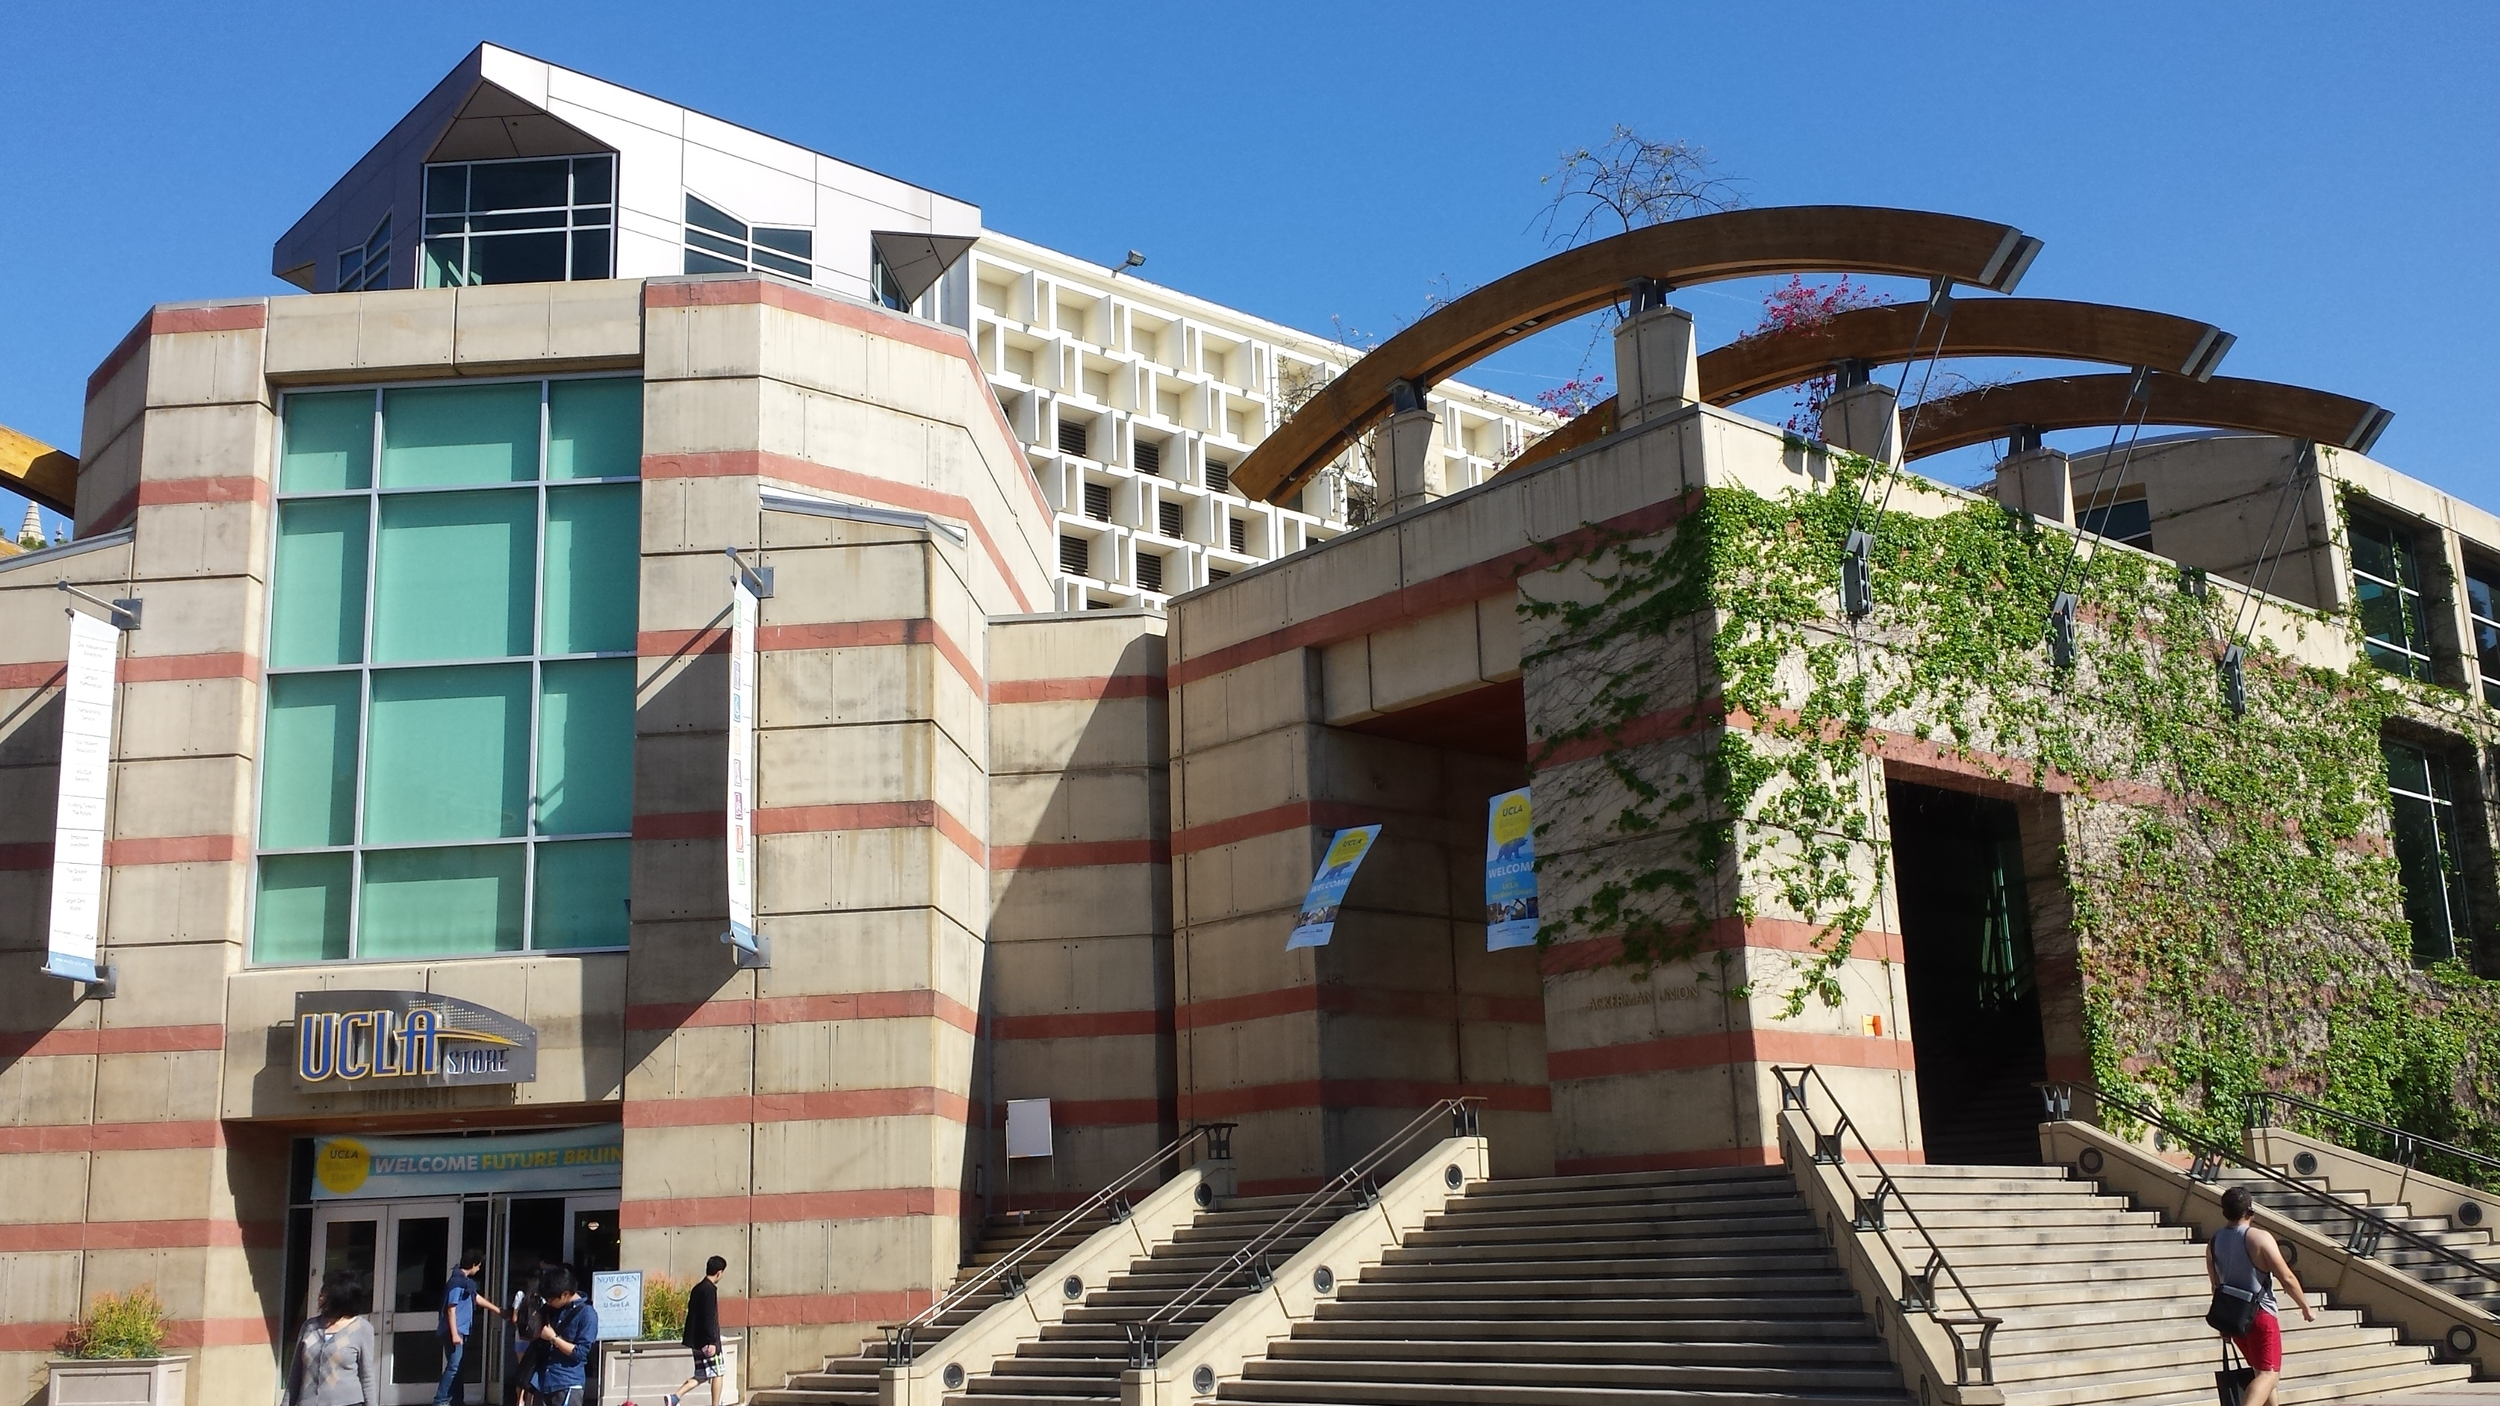 UCLA 2.jpg